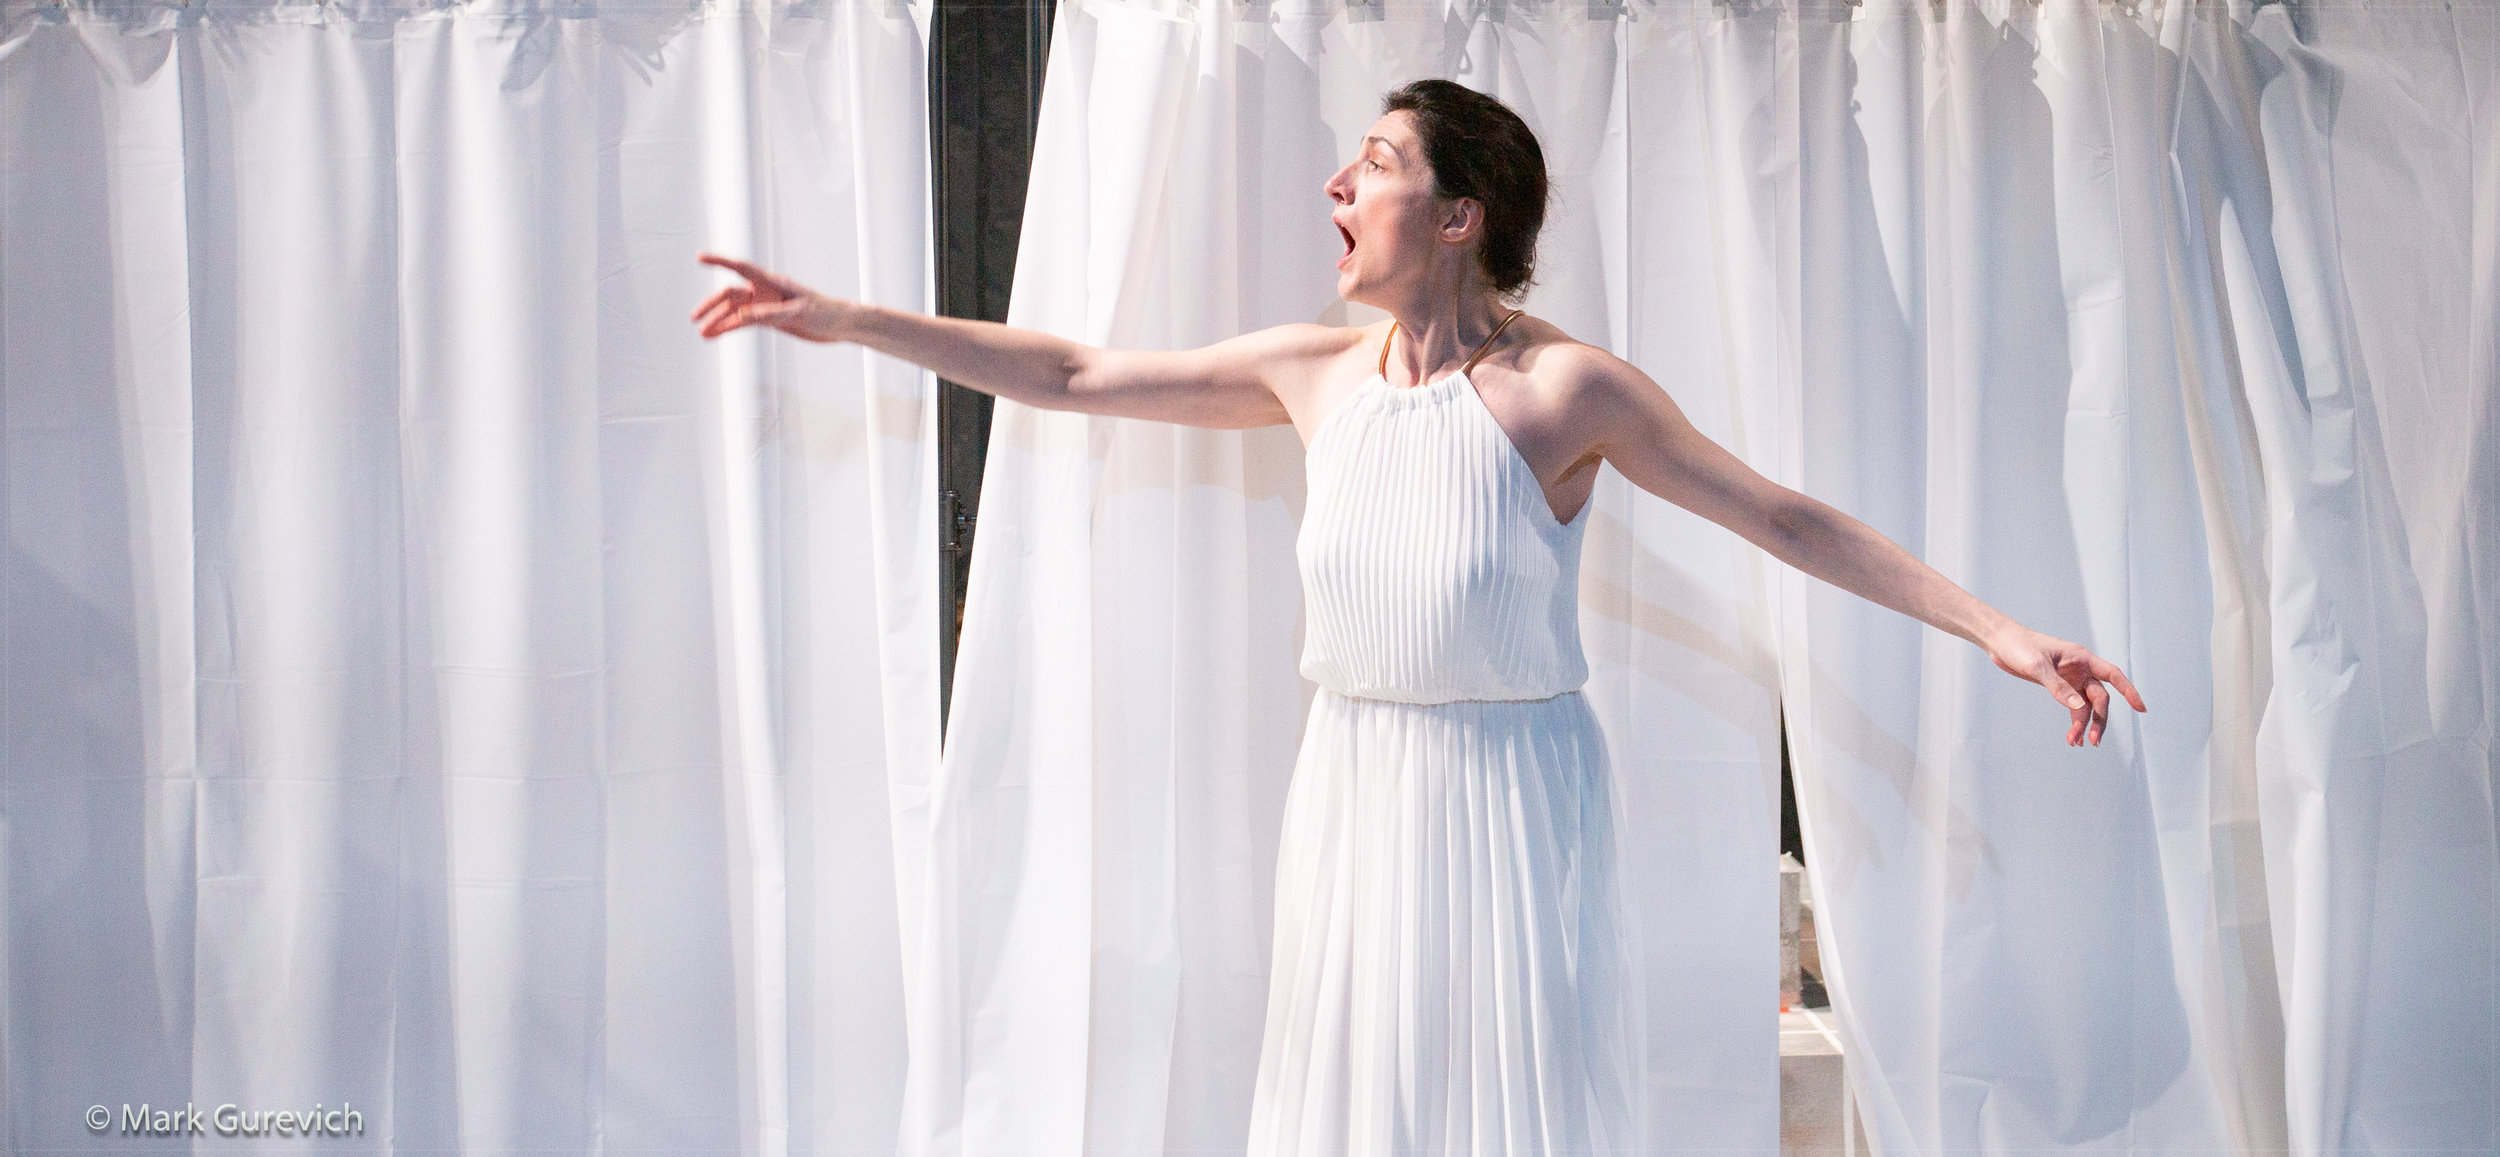 Katherine-McClintic-Choreographer-MedeaMarkGurevich31.jpg